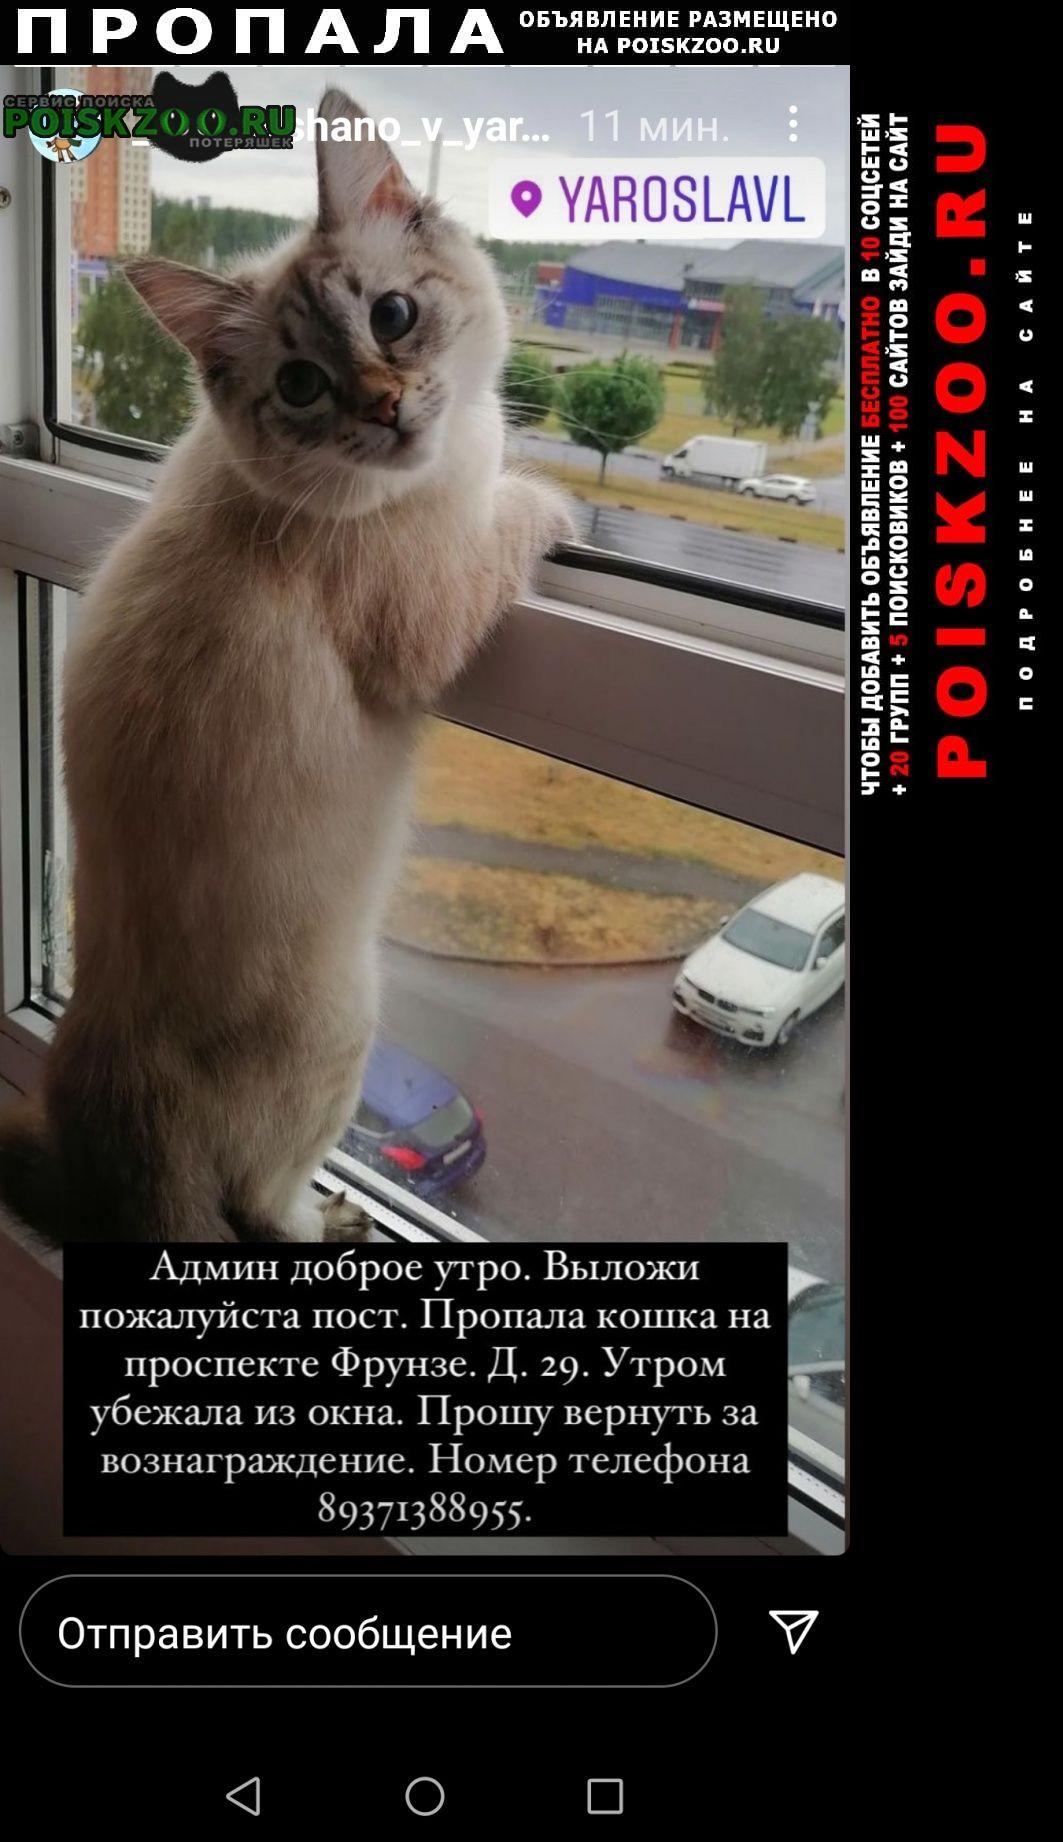 Пропала кошка на проспекте фрунзе. Ярославль